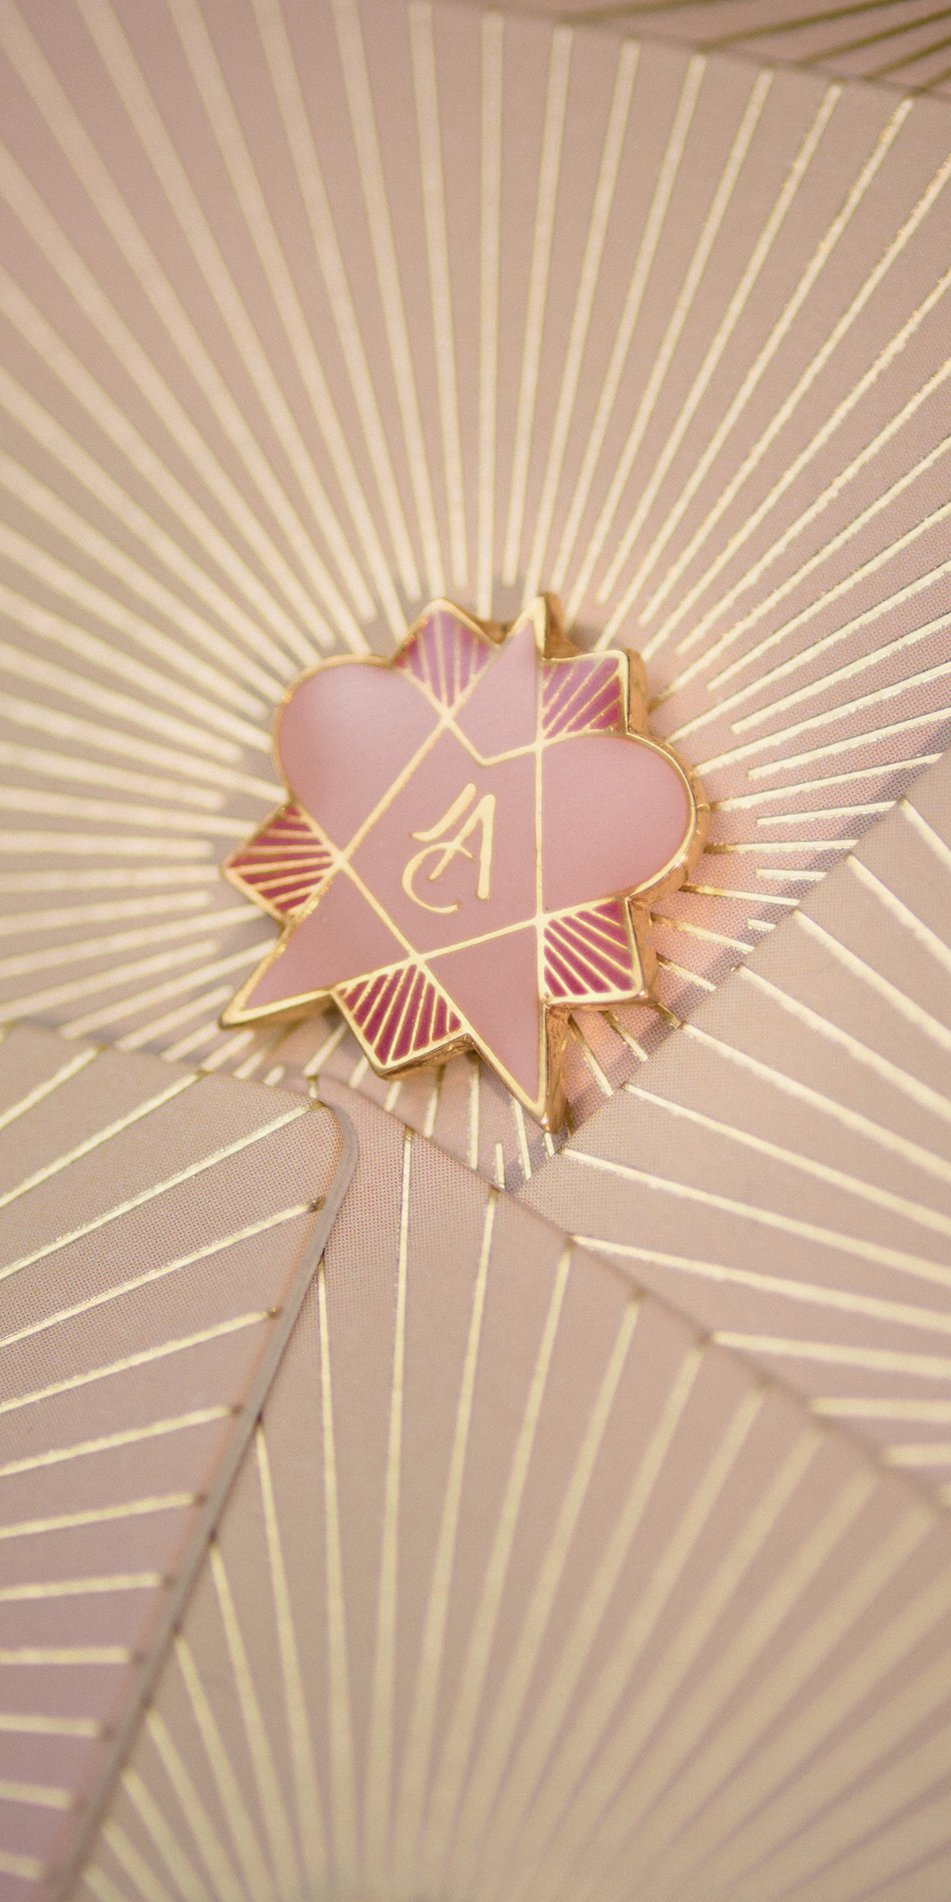 STEARHEART enamel magnetic pin arcturus 2